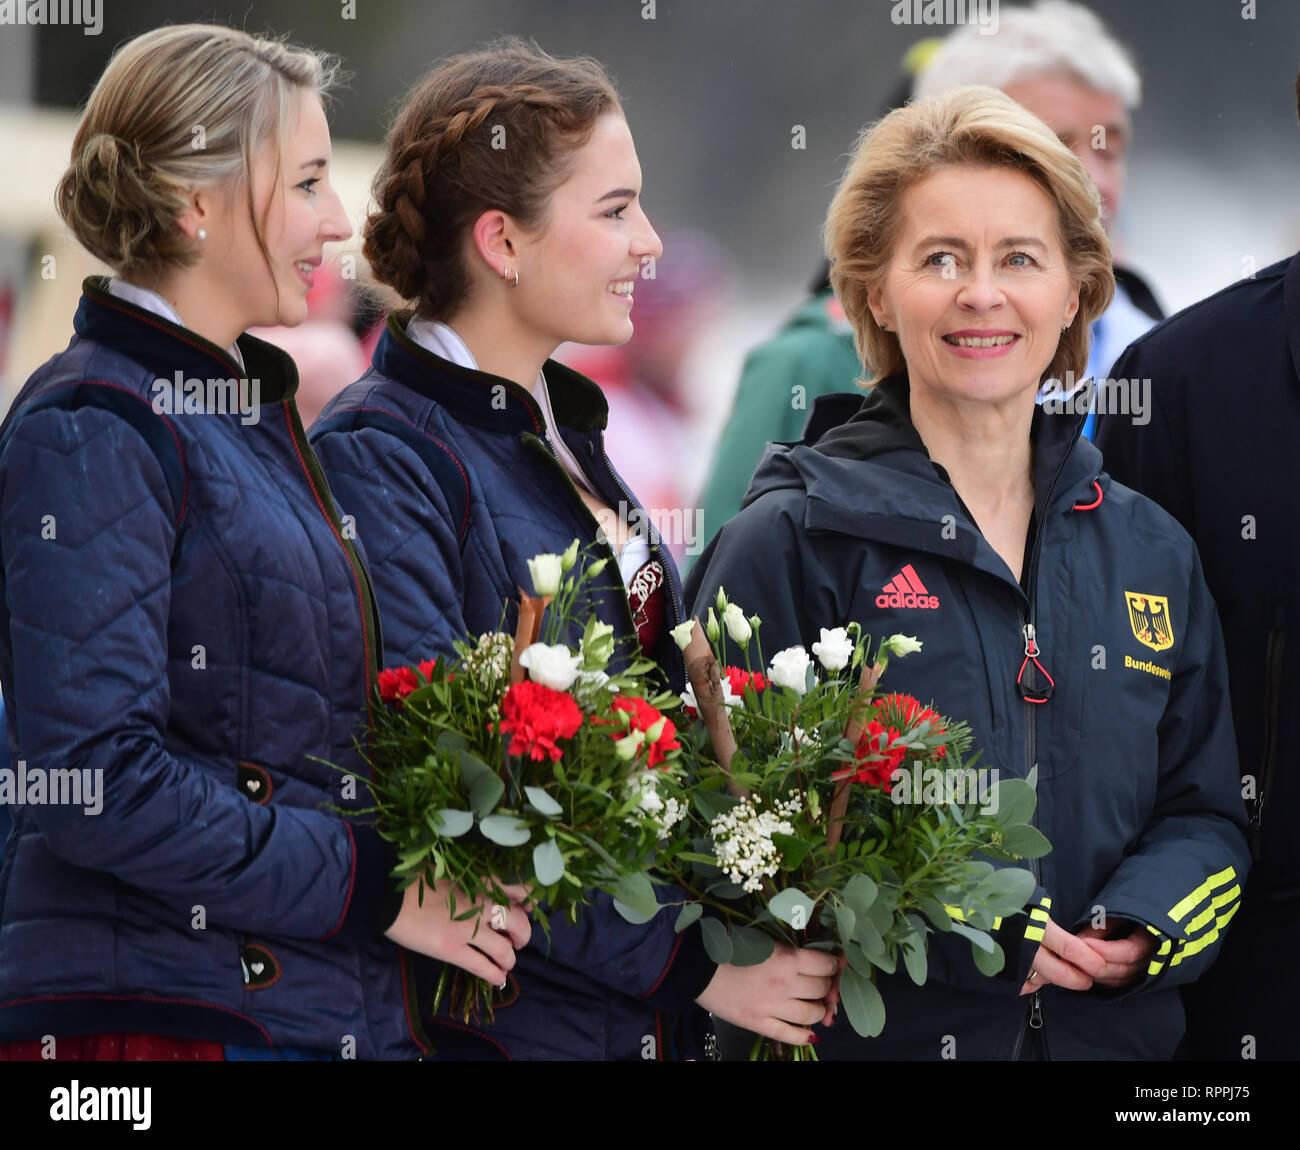 Singles Flaurling, Kontaktanzeigen aus Flaurling bei Tirol bei